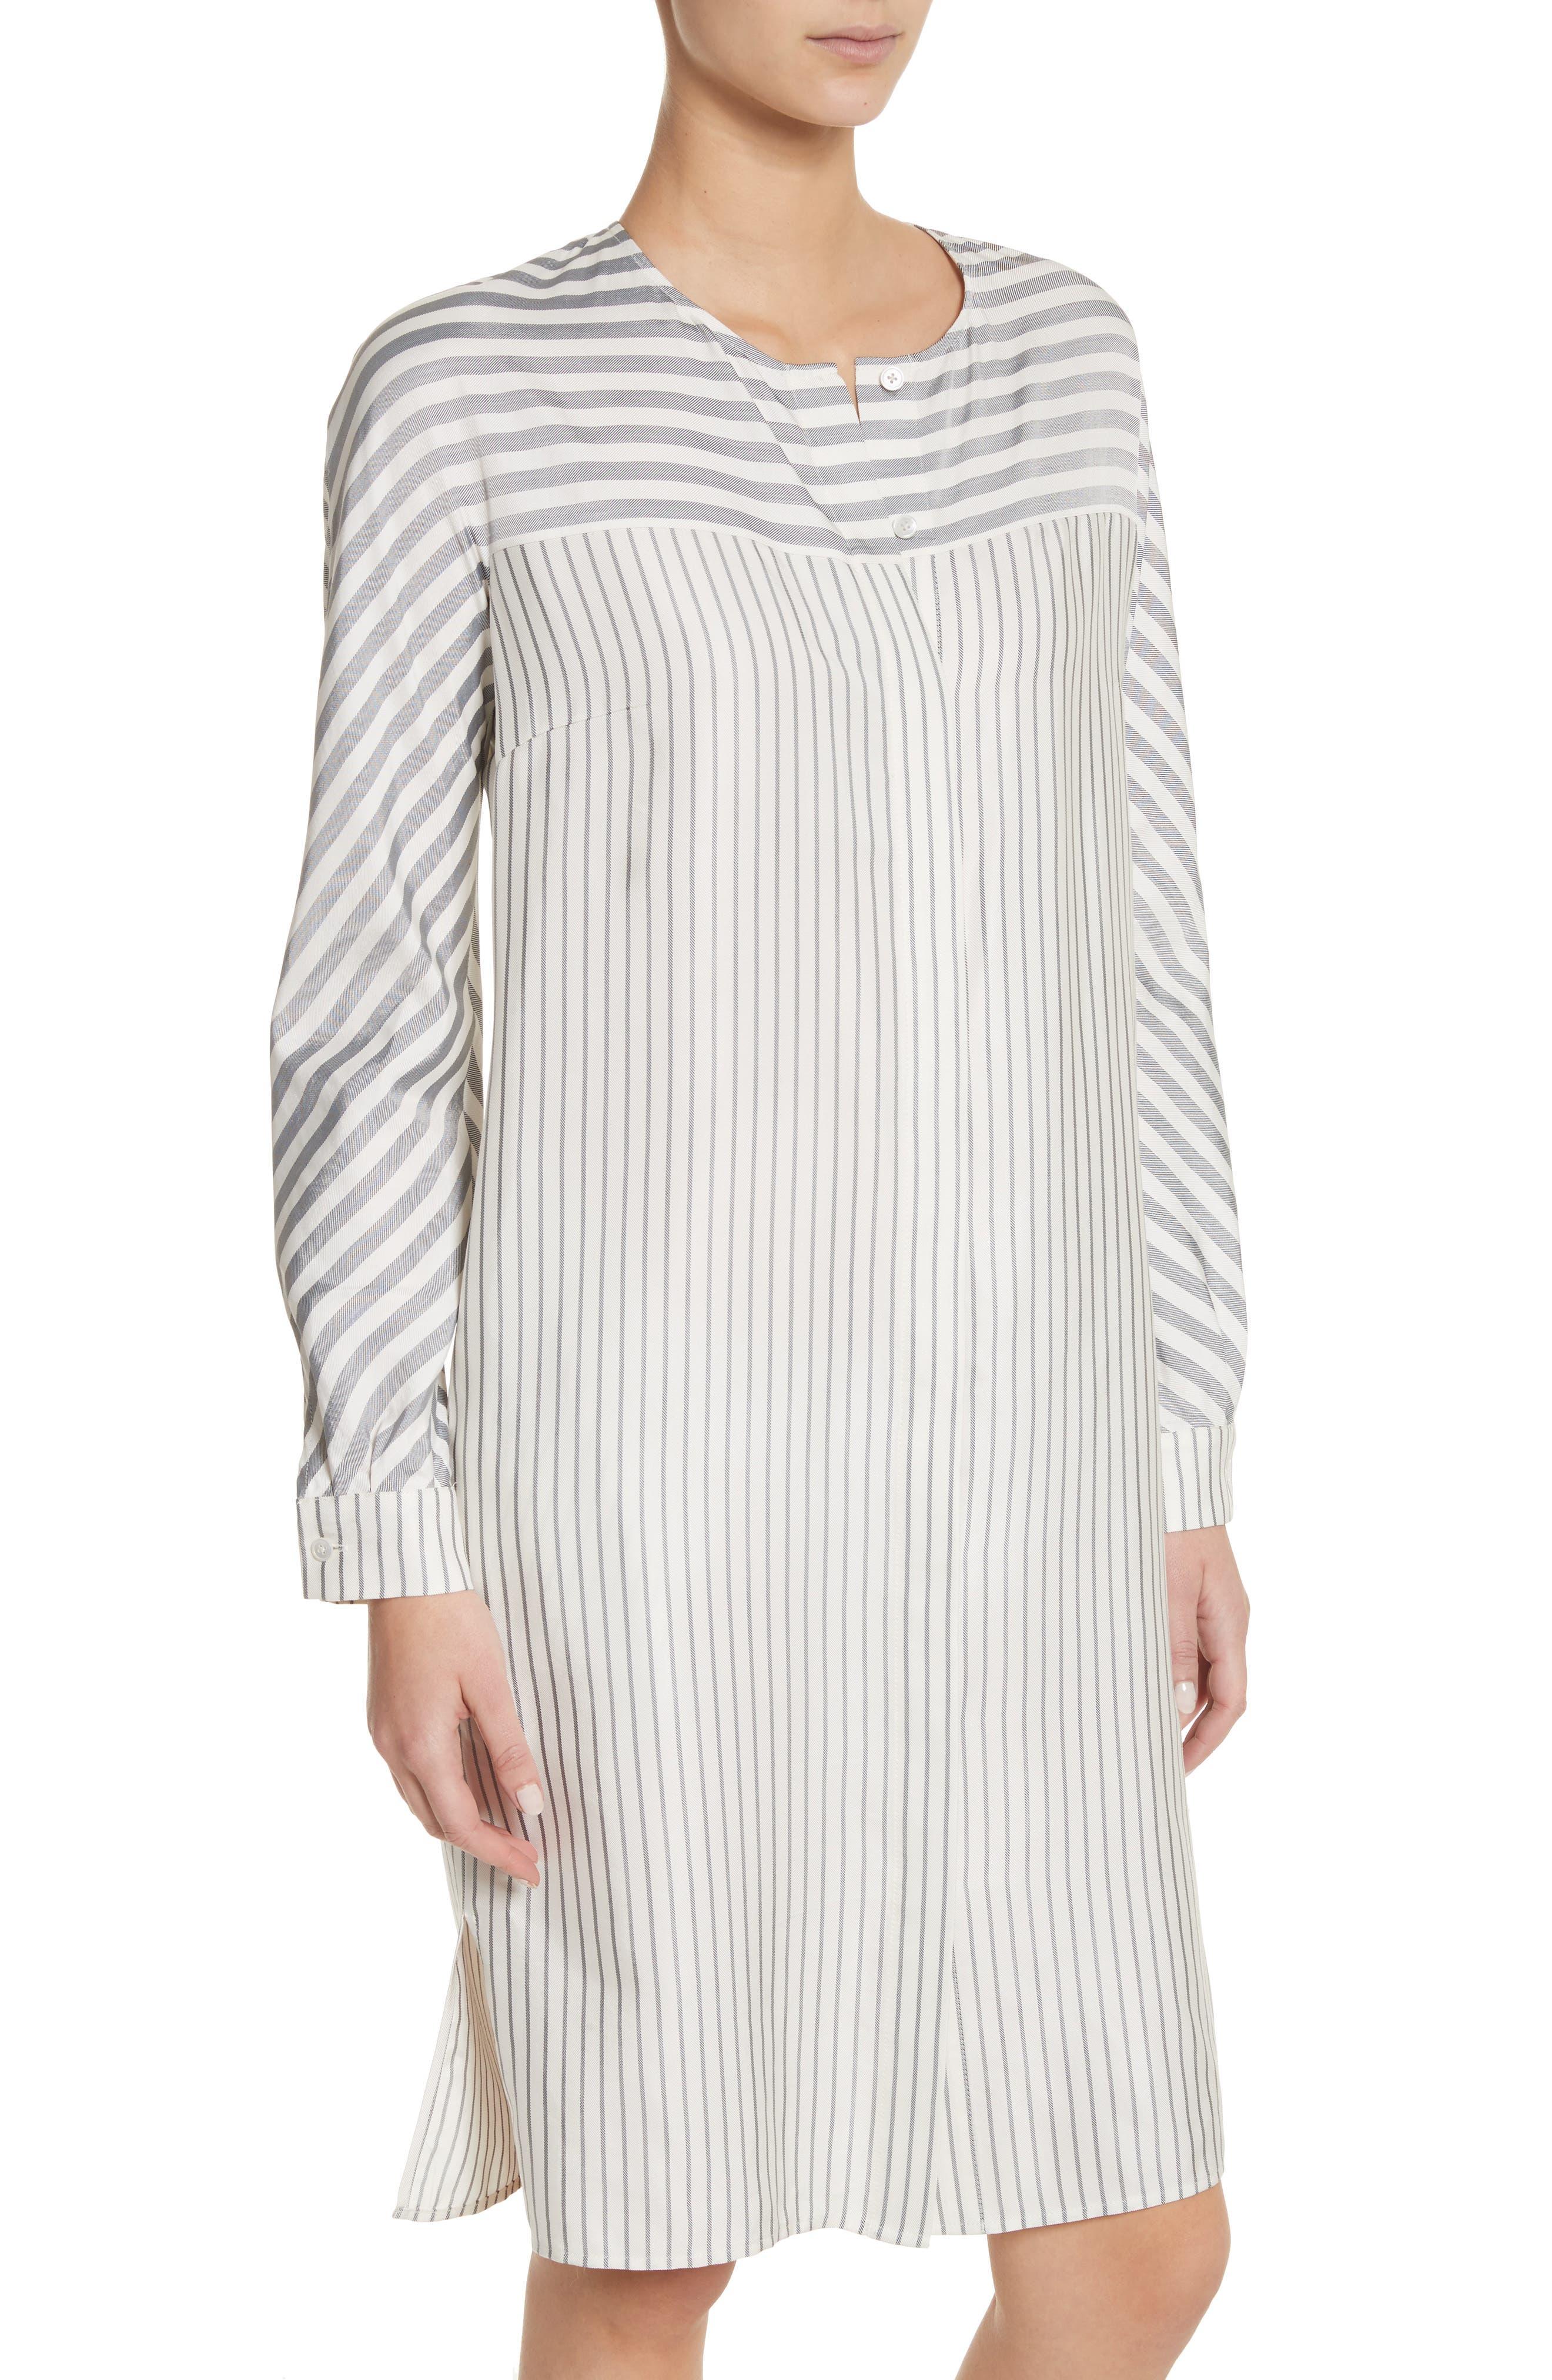 ST. JOHN COLLECTION,                             Stripe Tie Neck Shirtdress,                             Alternate thumbnail 5, color,                             900